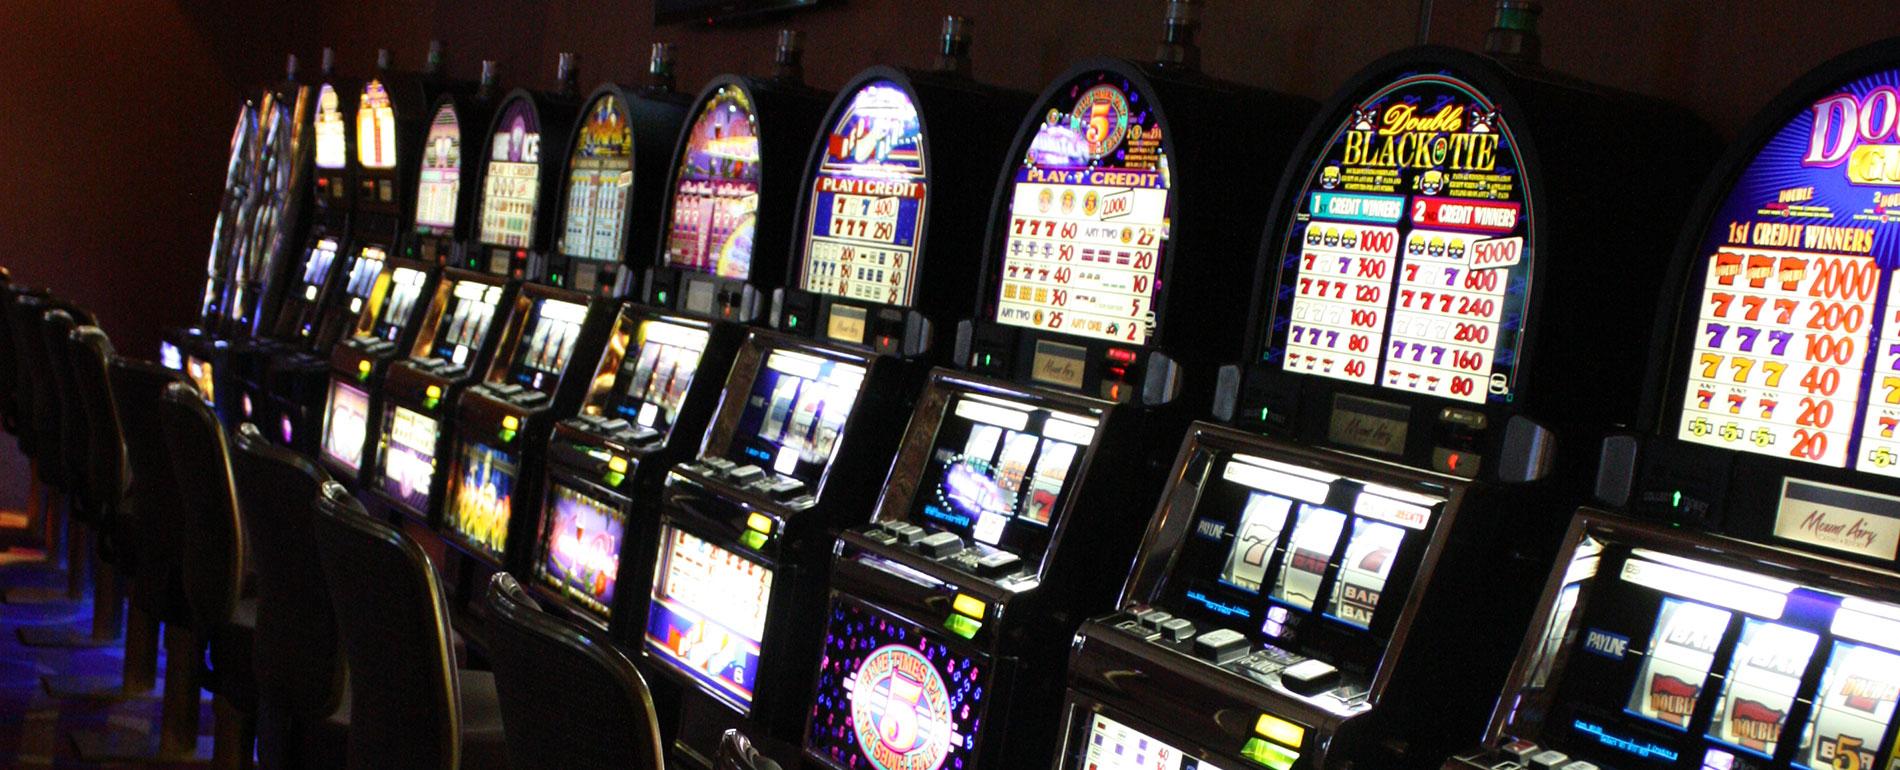 mt pocono slot machines